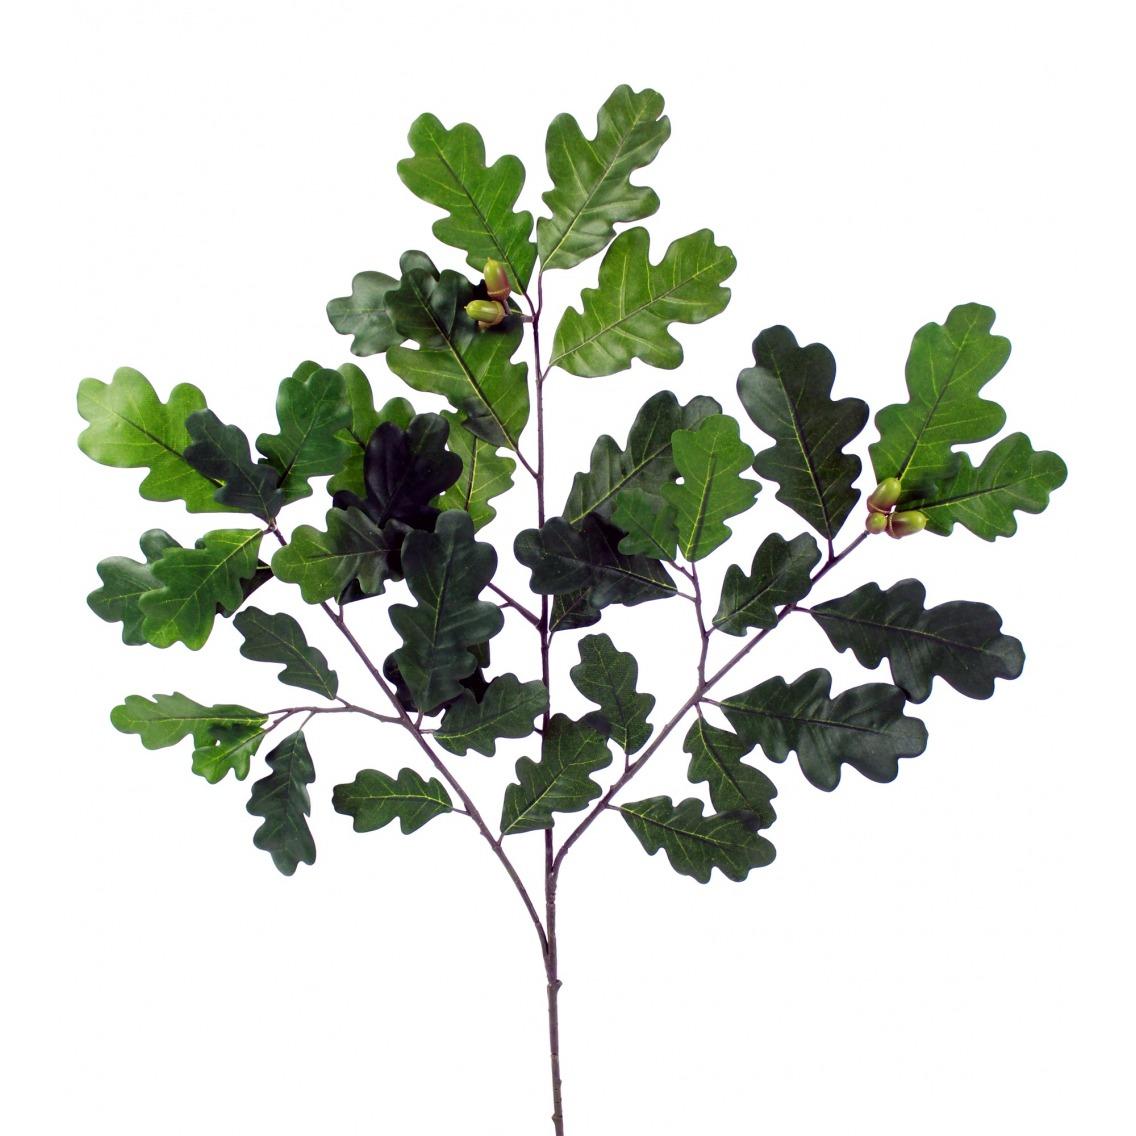 Branche de chêne feuillue